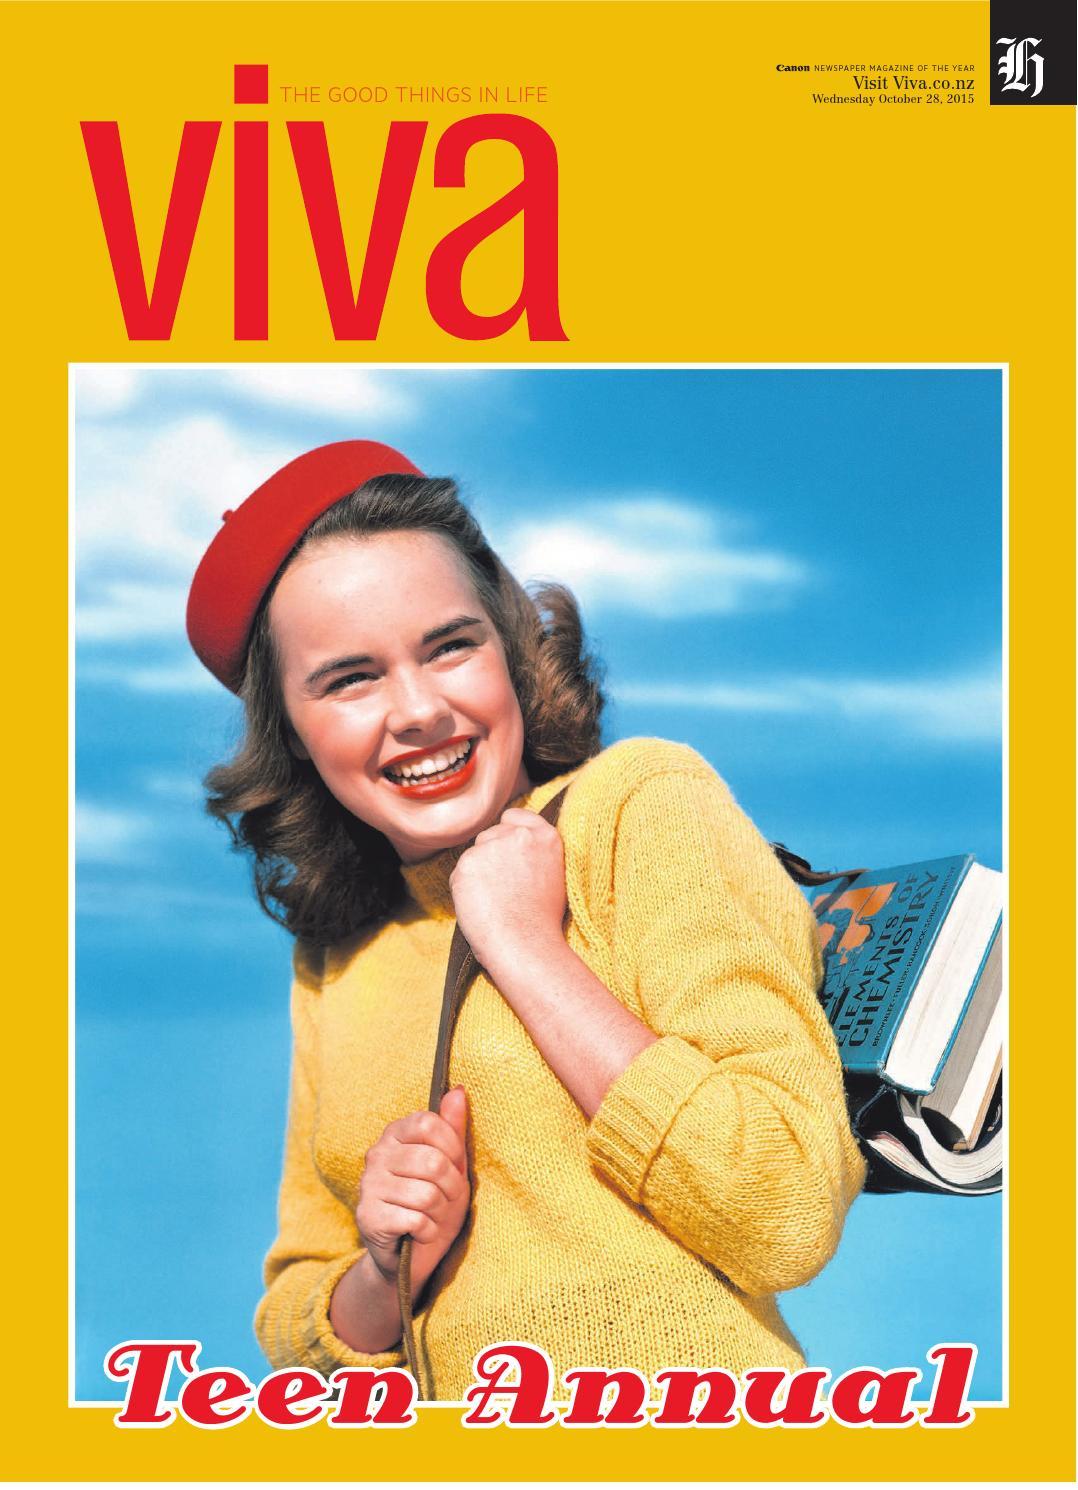 NZH Viva 28th October by NZME. - issuu